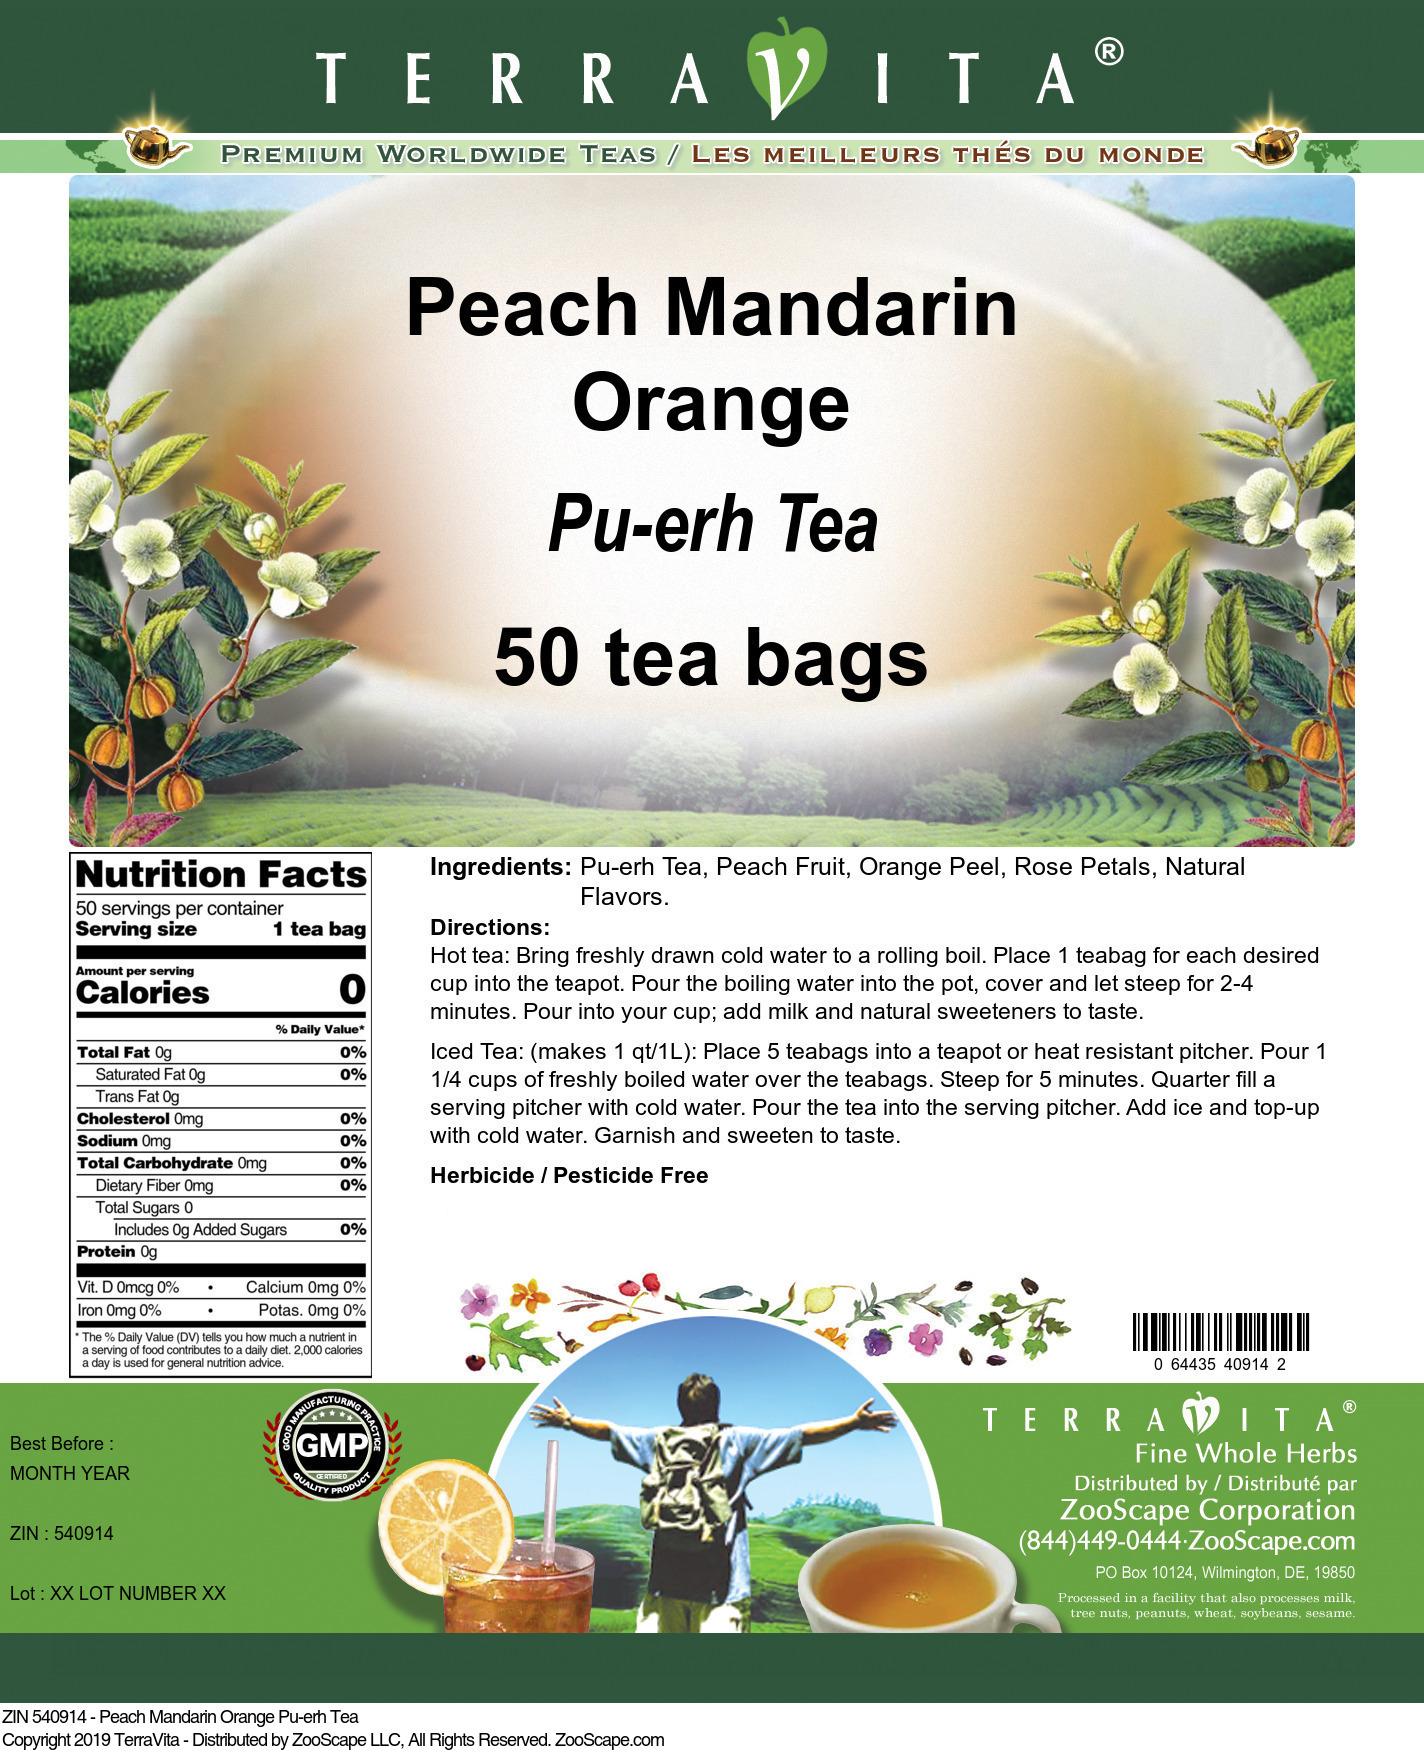 Peach Mandarin Orange Pu-erh Tea